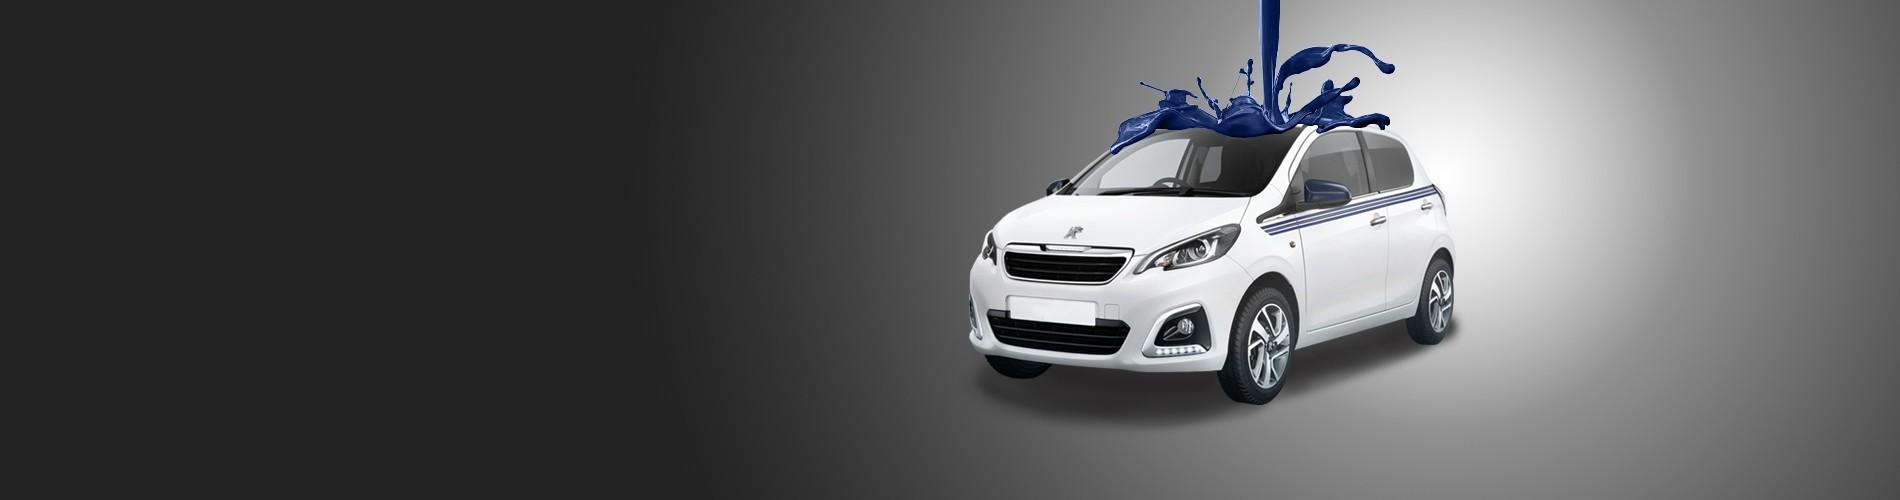 My Beautiful Car - Peugeot Decals